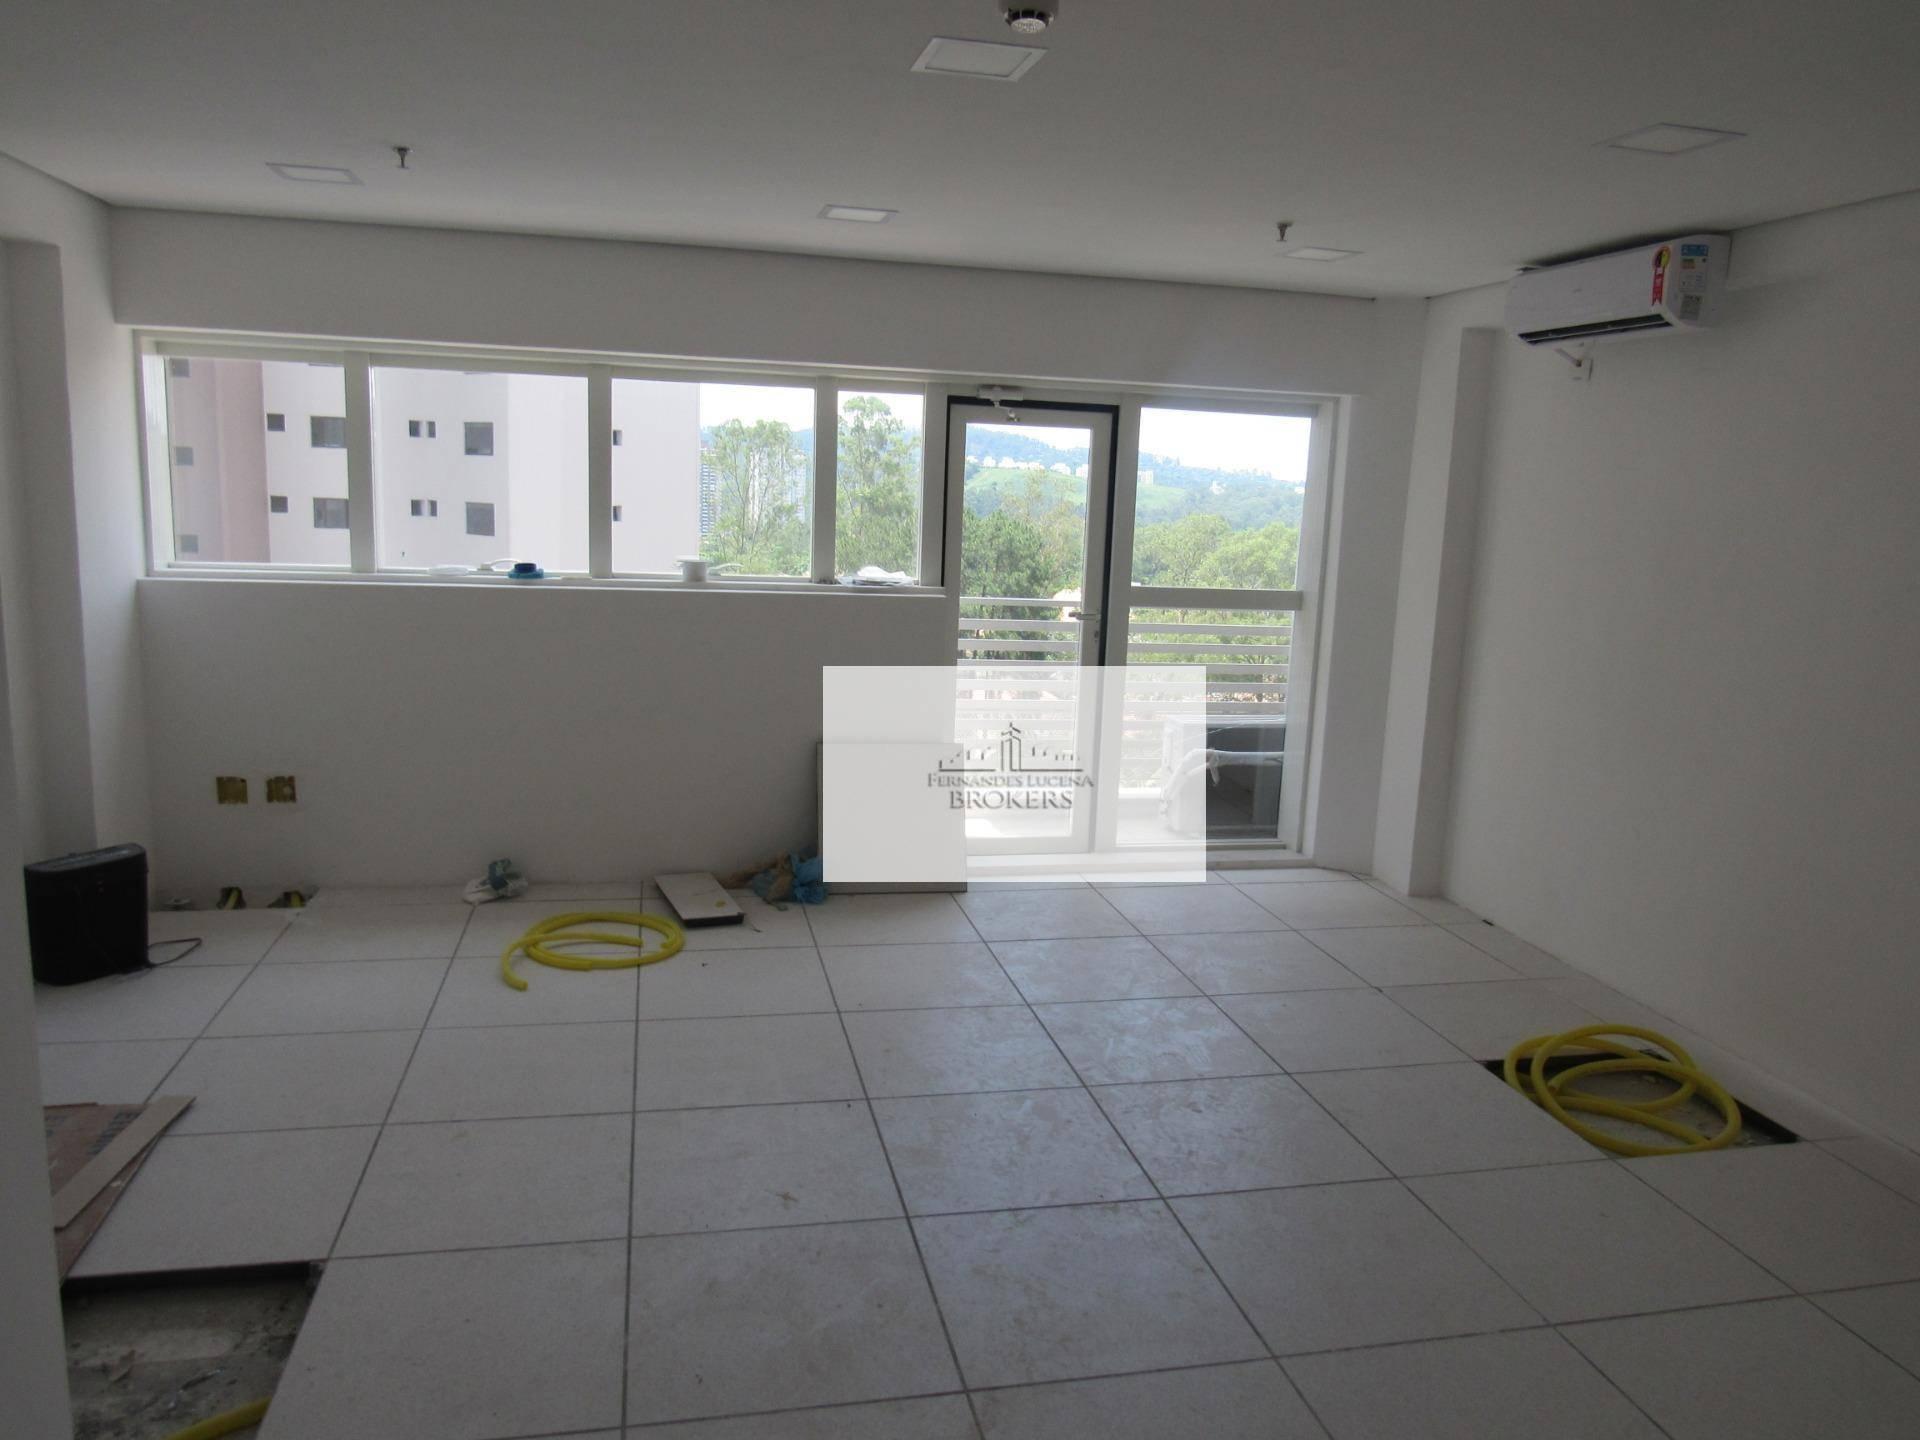 Conjunto para alugar, 31 m² por R$ 1.400/mês - Alphaville - Barueri/SP